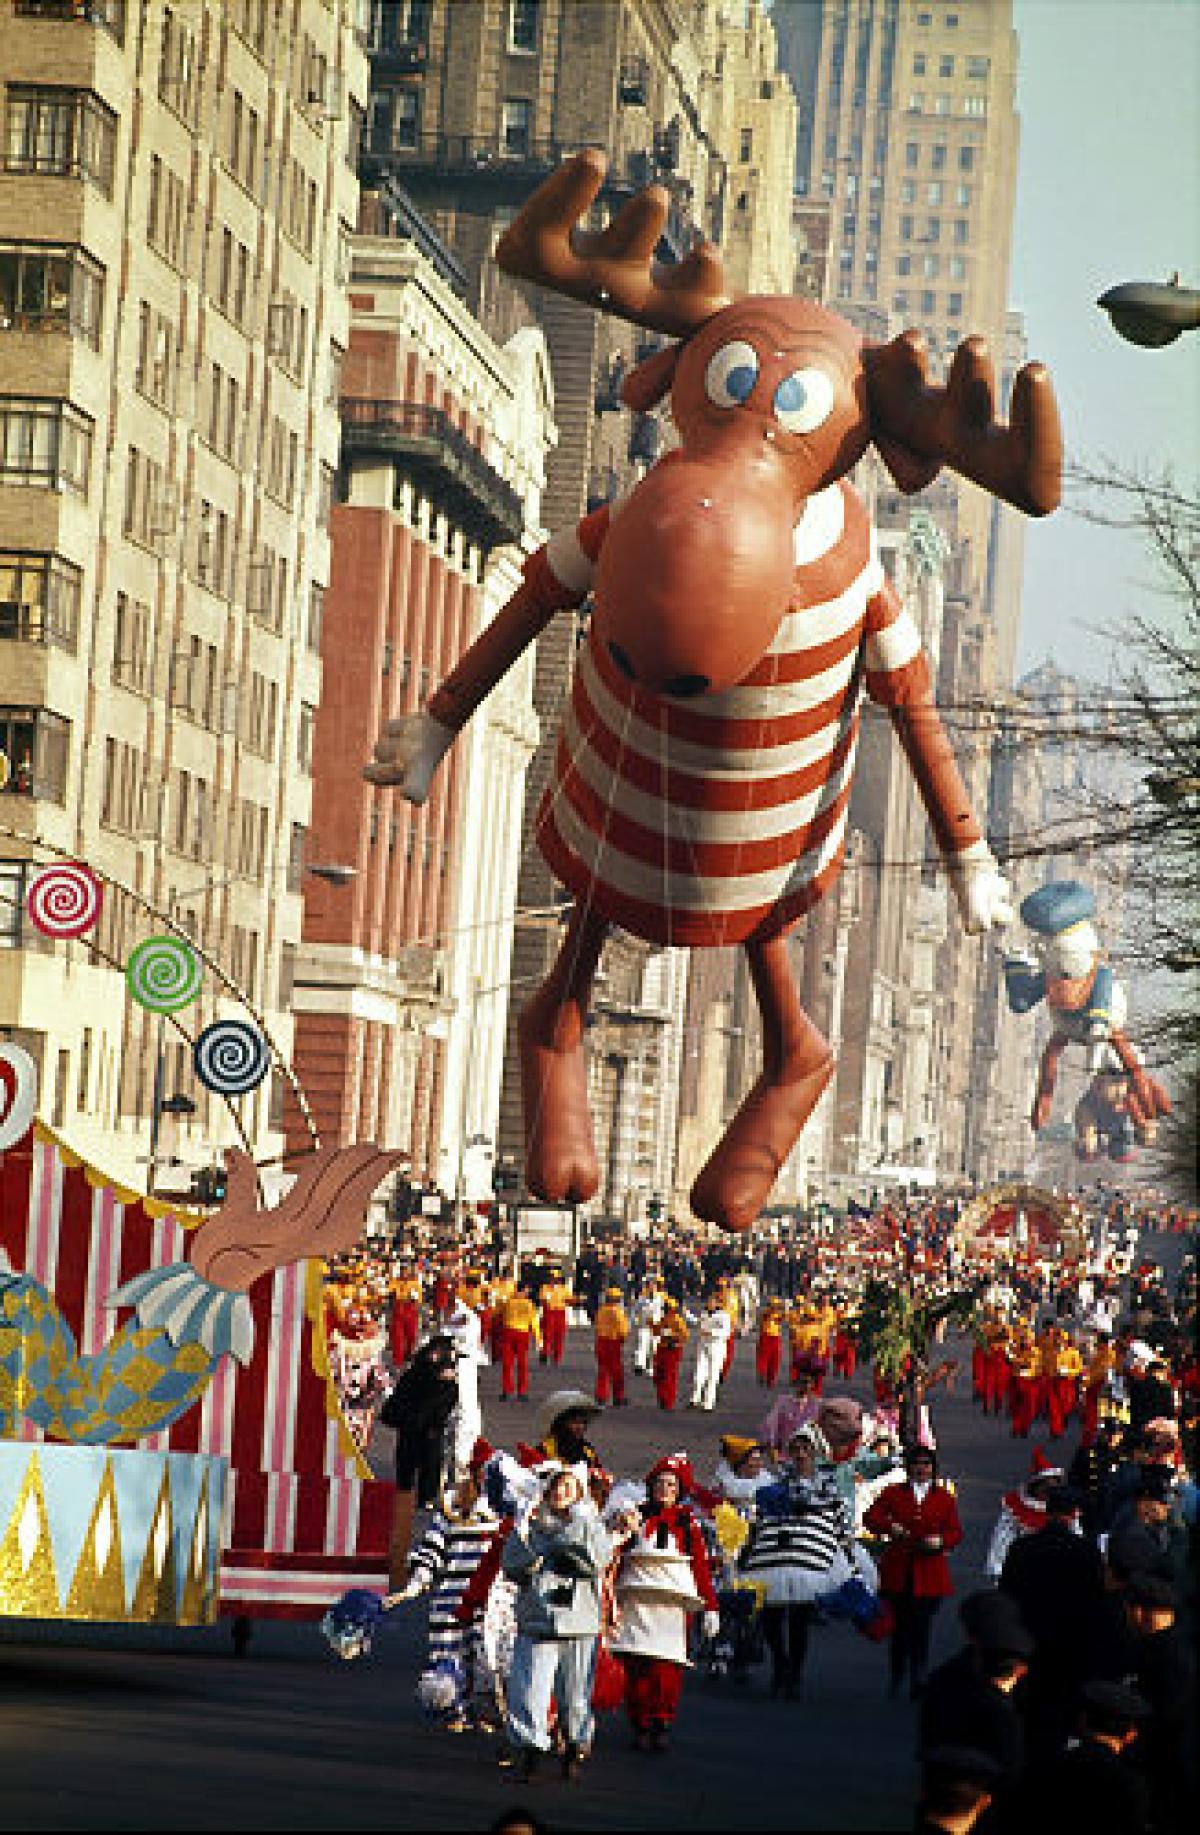 Everyone loves a parade1_1280.jpg